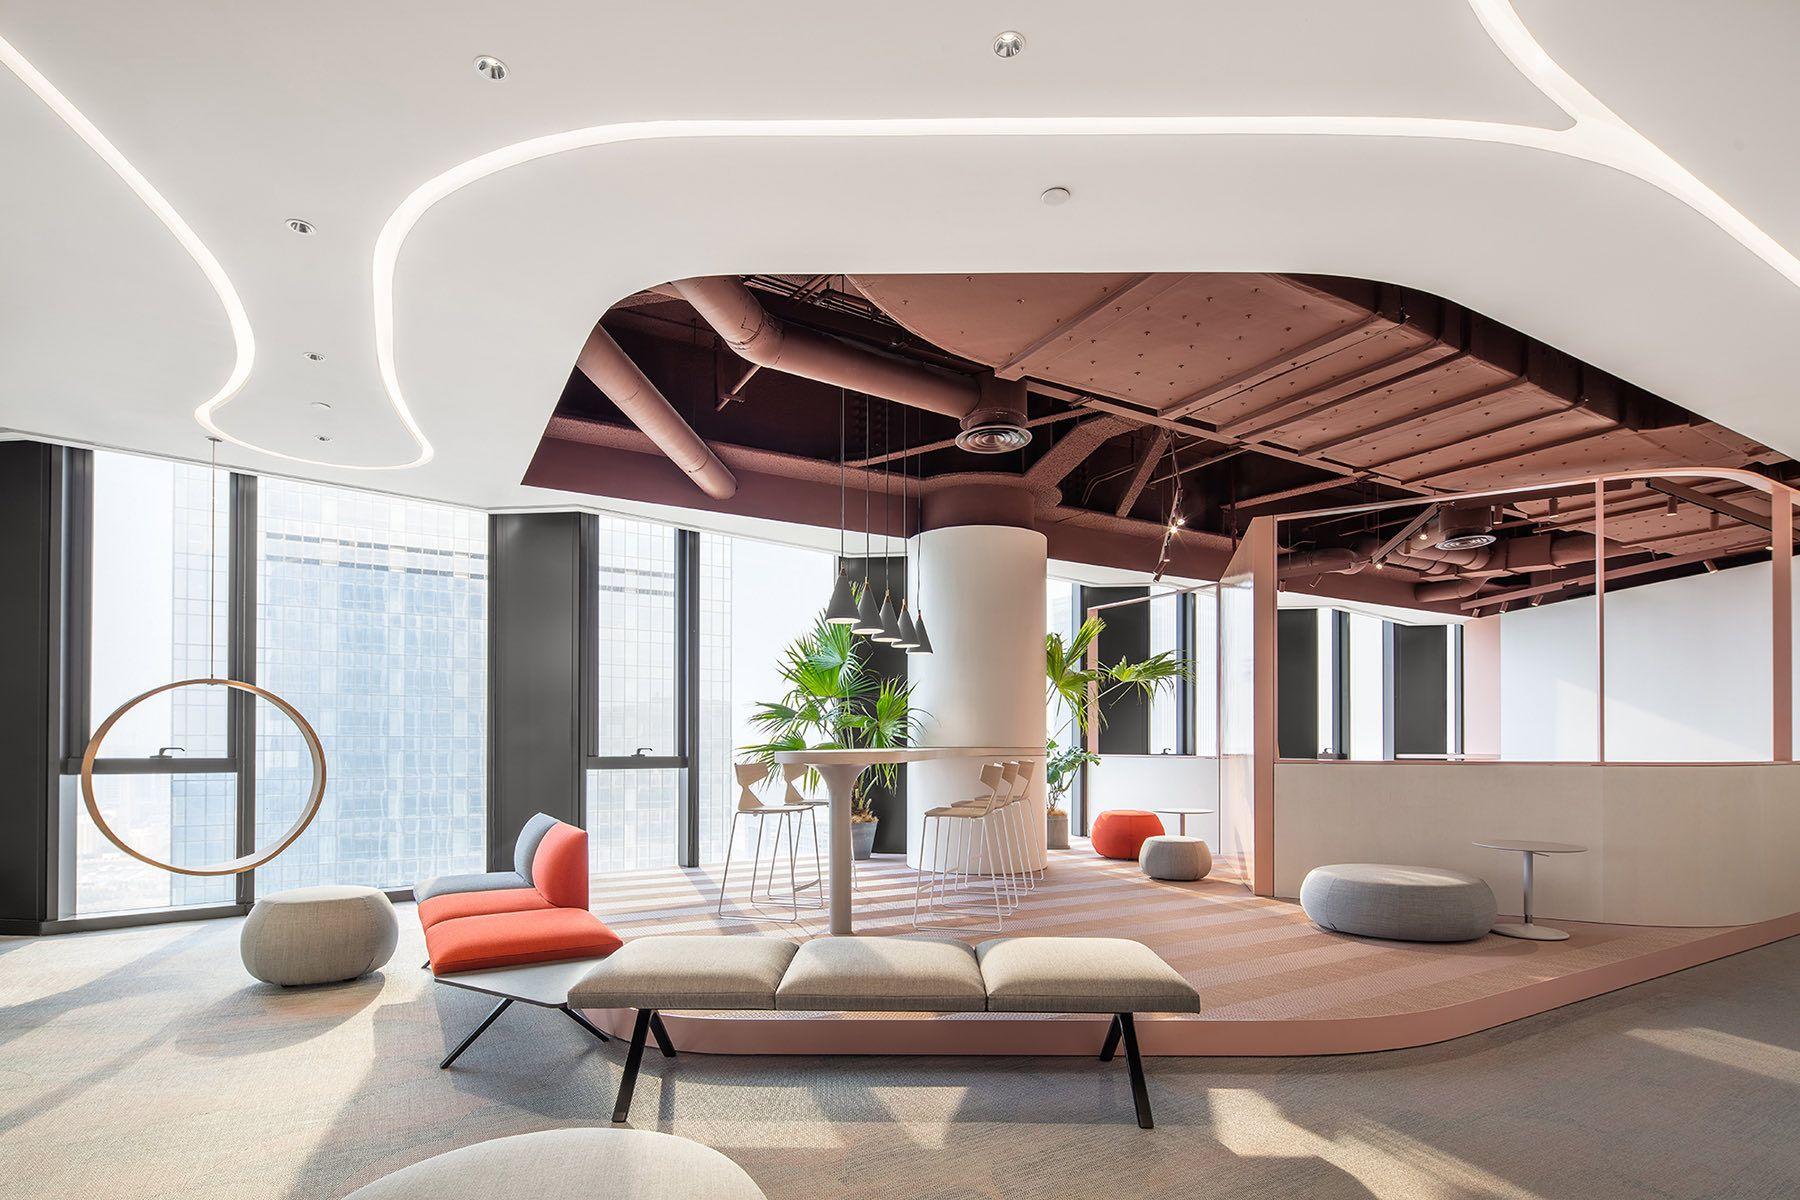 A Look Inside Private E Commerce Company In Xi An Office Interior Design Office Interiors Interior Design